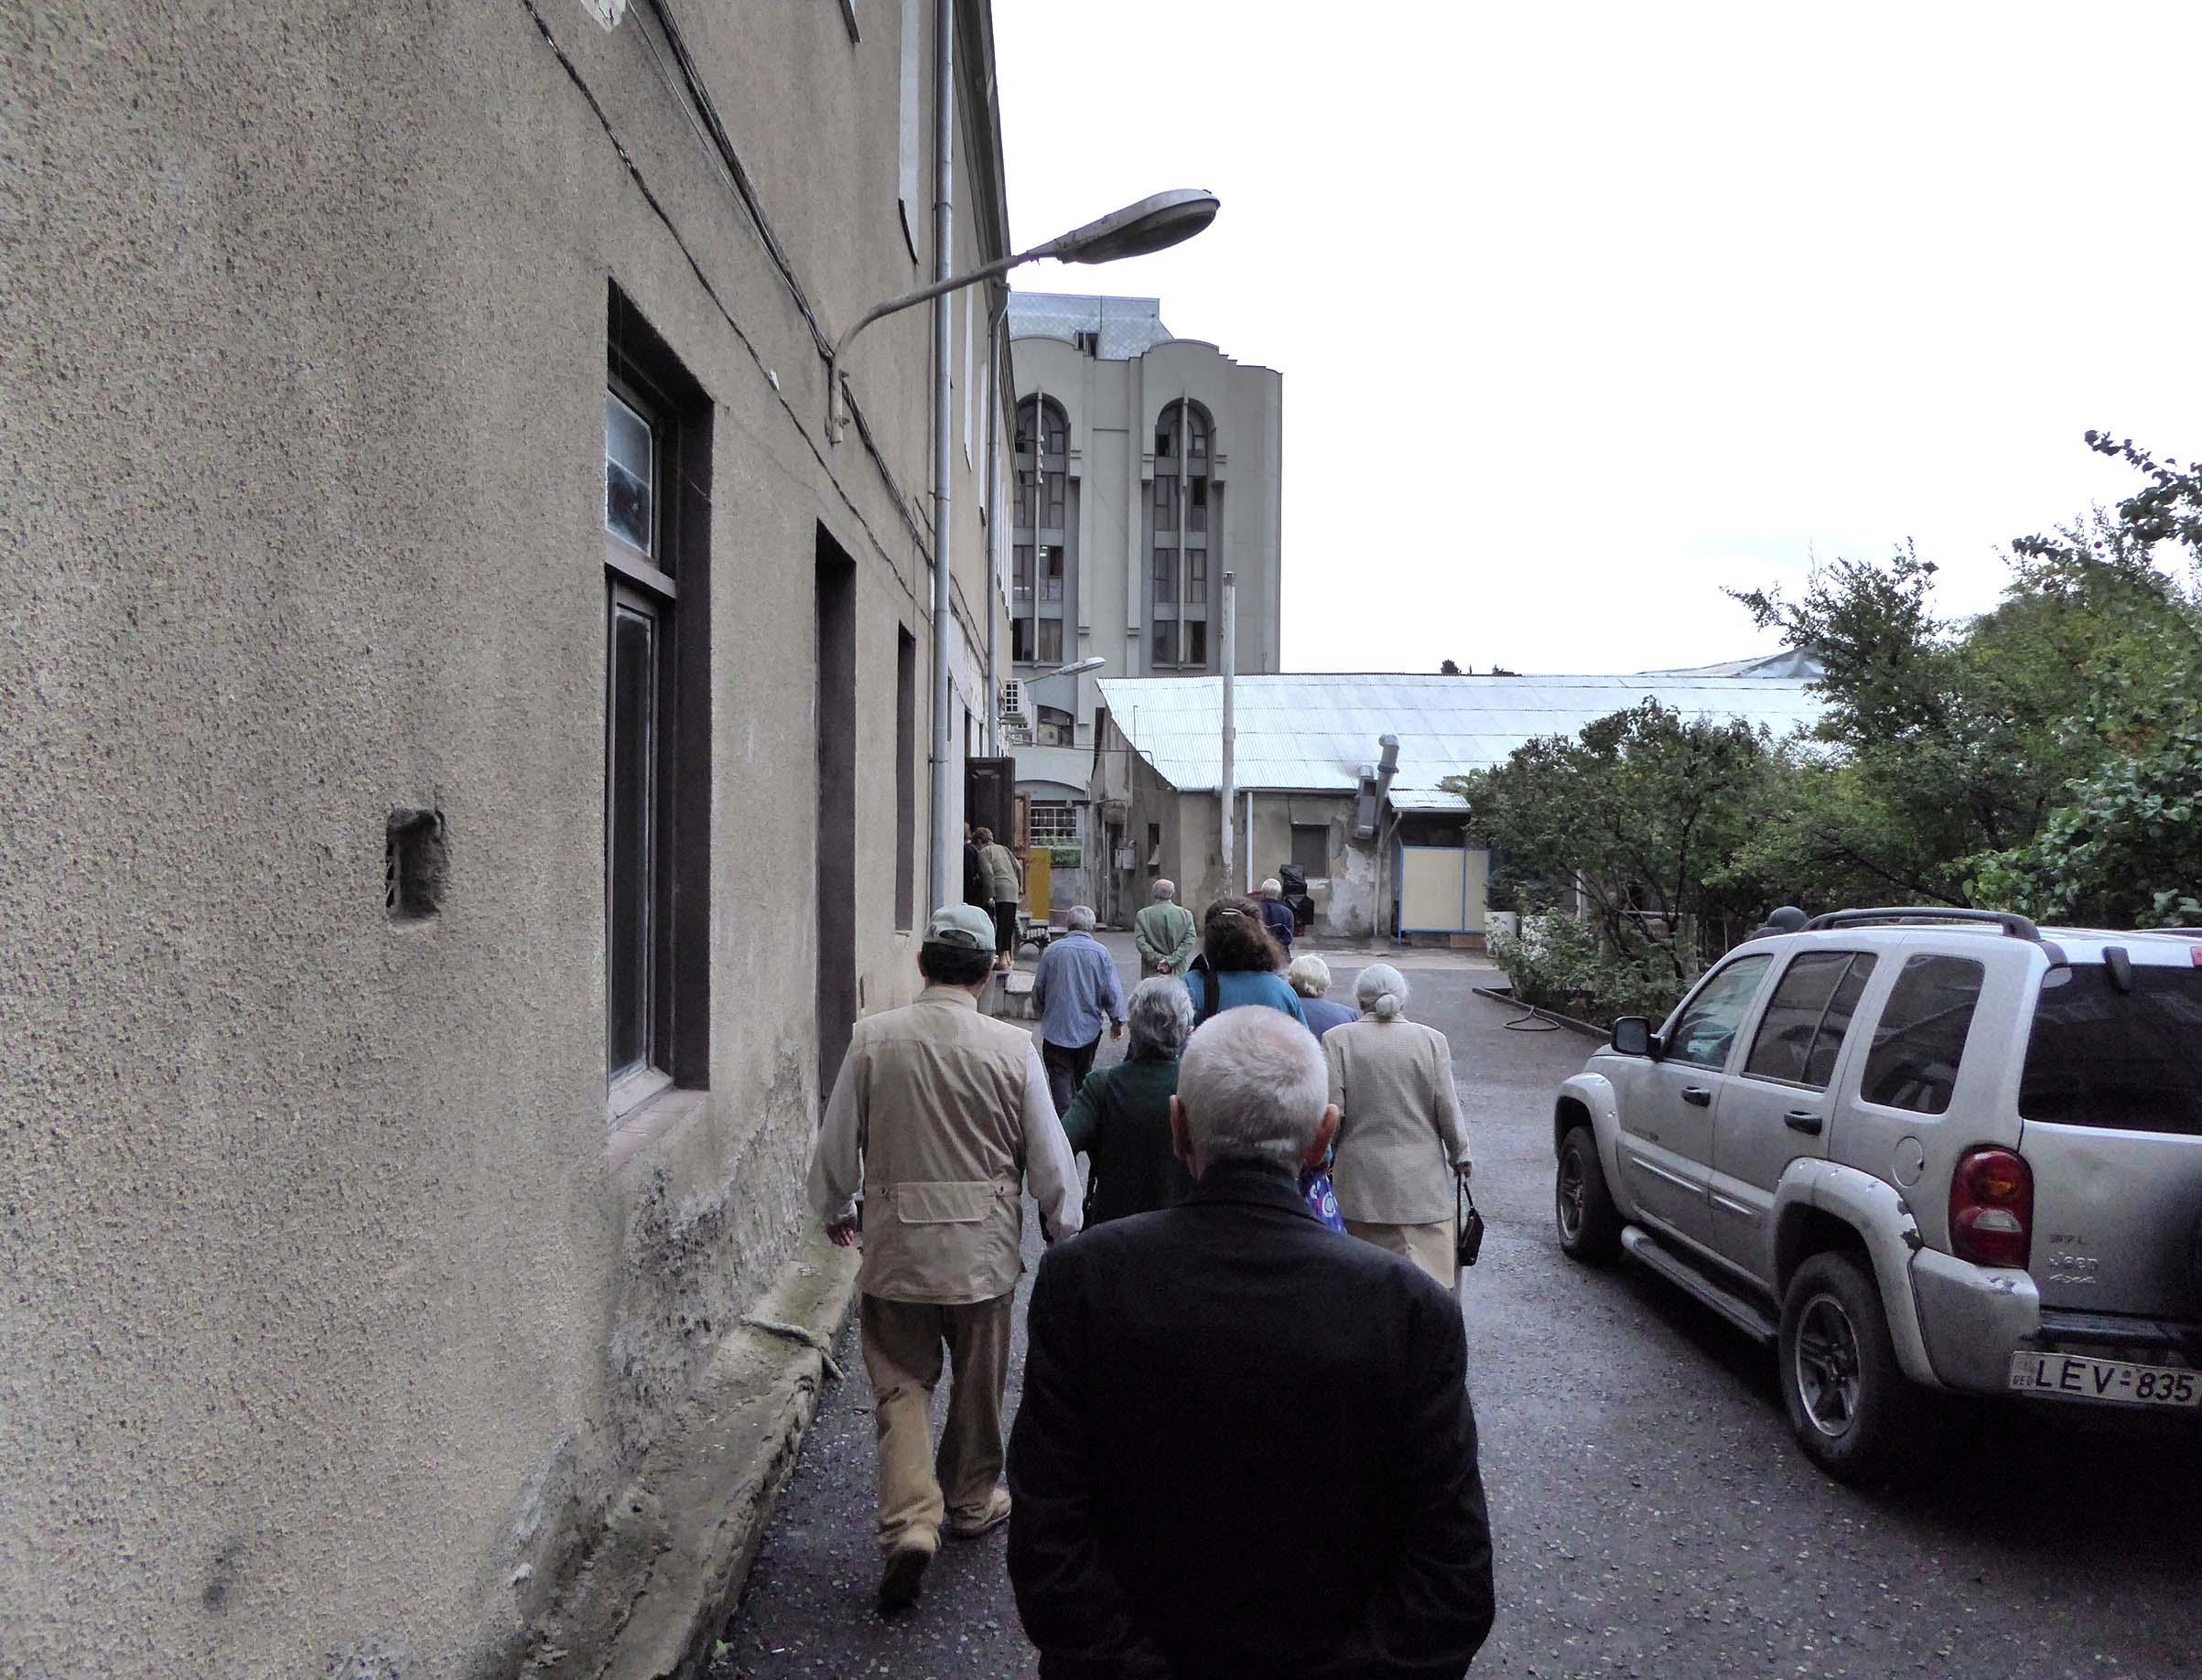 apa &#39;15_Footnotes on... / Informal meeting oct 2015 <br />(Giorgi Leonidze State Museum of Georgian Literature Tbilisi)